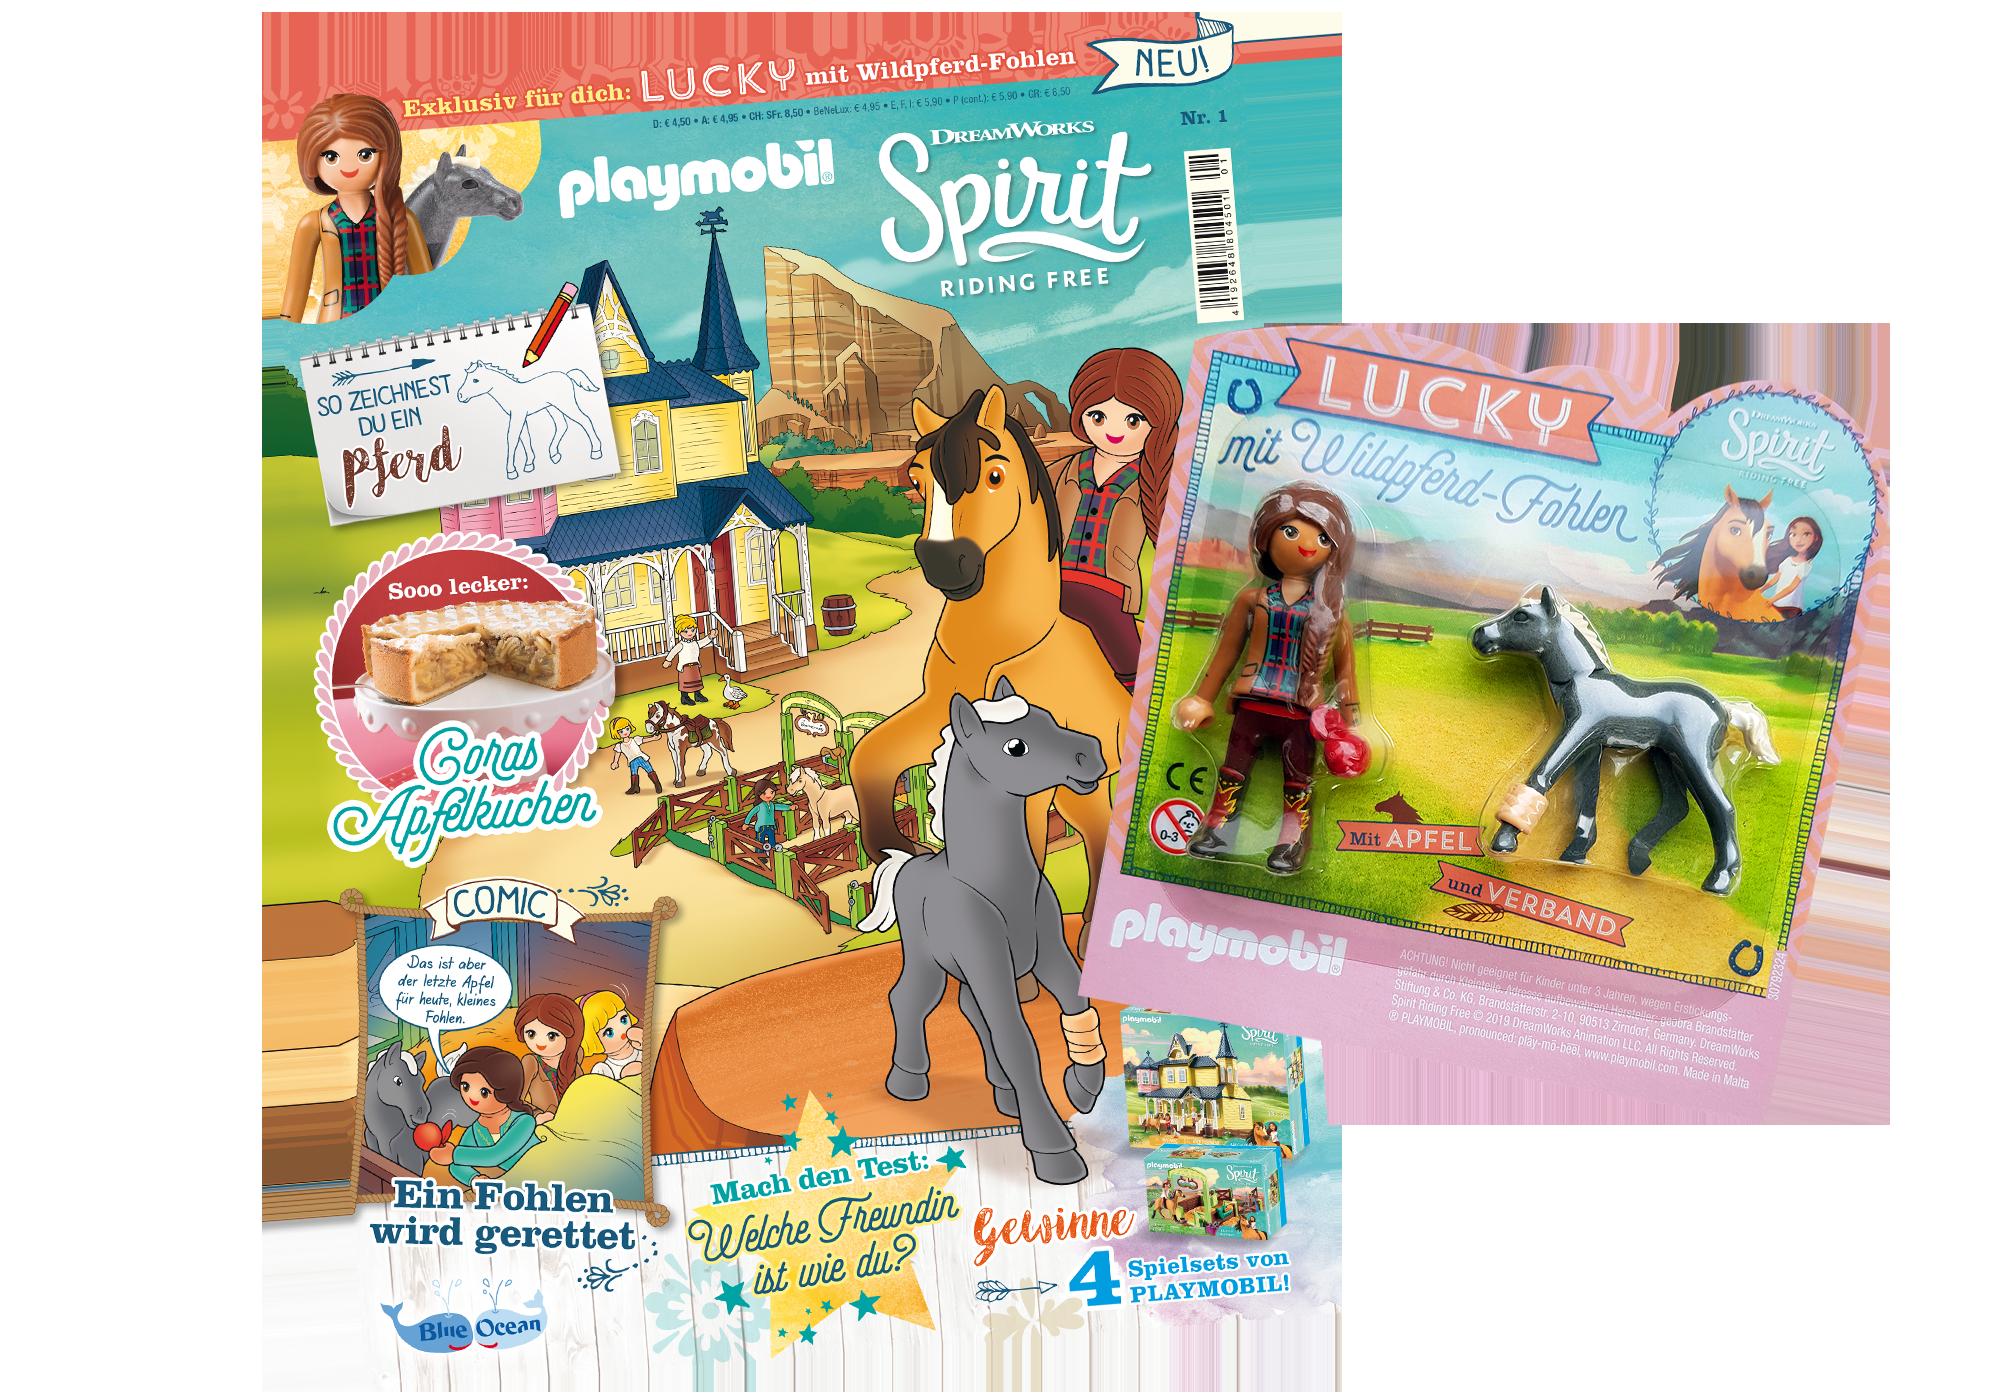 http://media.playmobil.com/i/playmobil/80622_product_detail/PLAYMOBIL-Magazin Sonderausgabe Spirit 1/2019